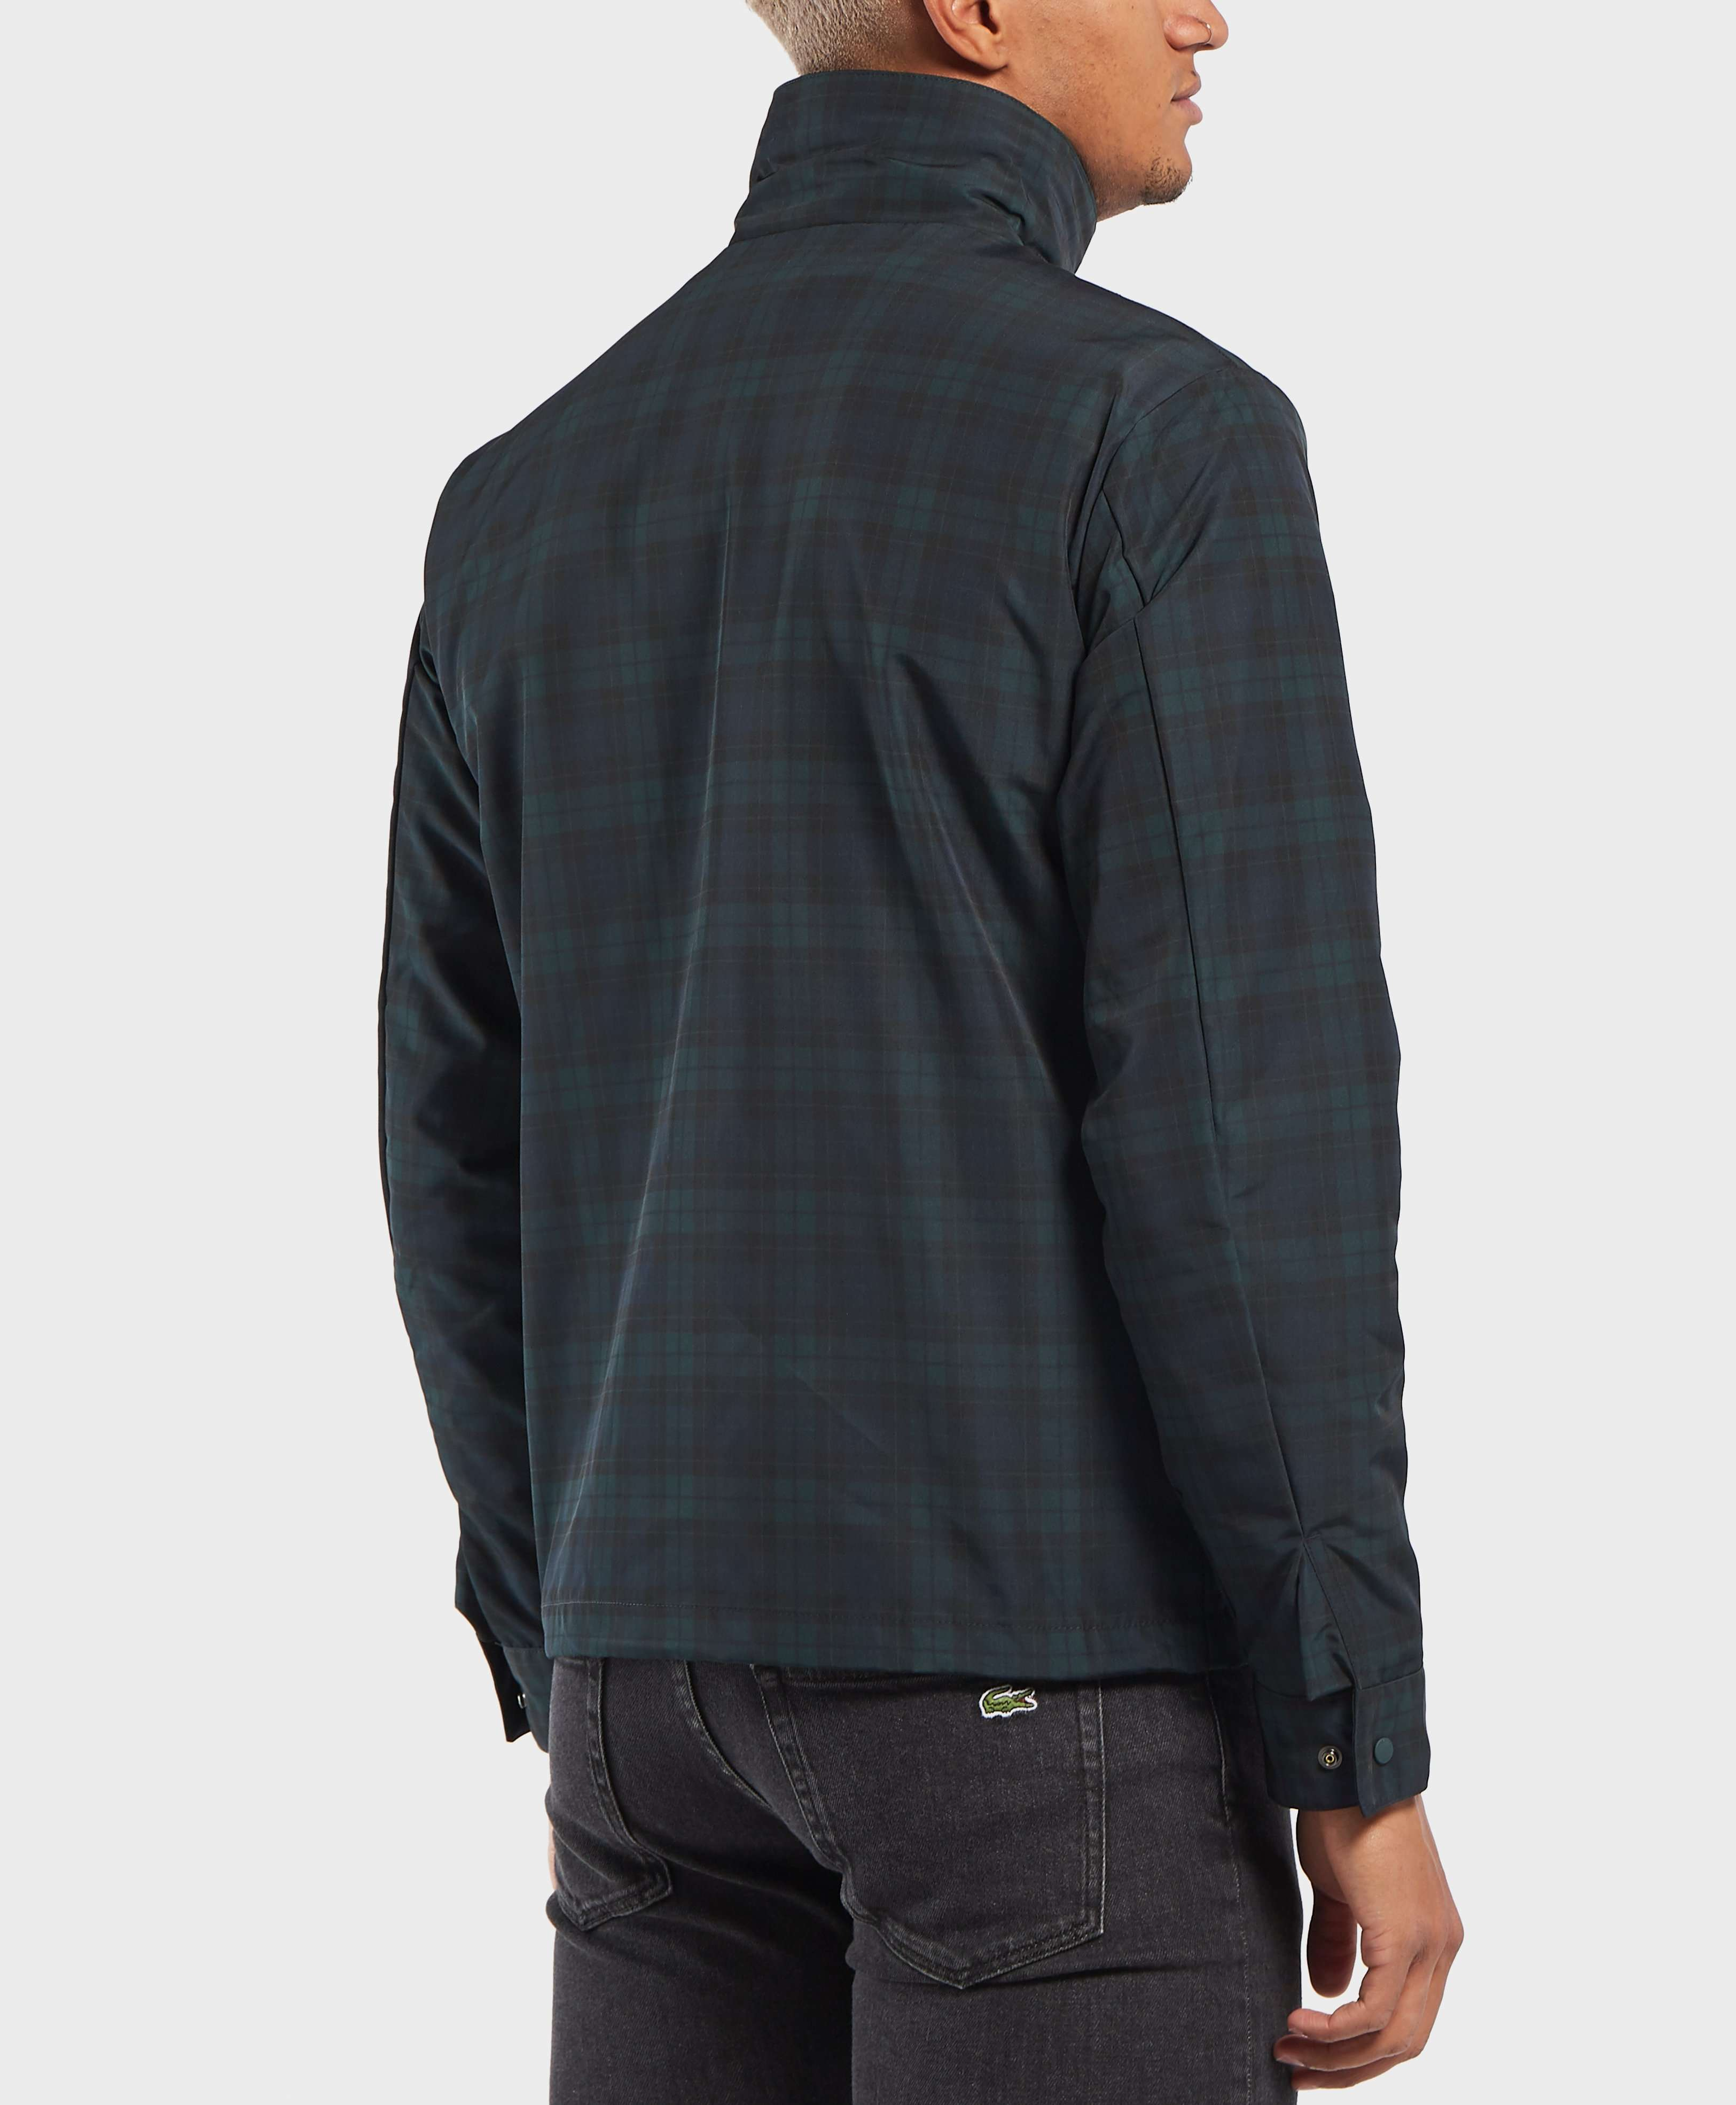 Lacoste Check Blouson Lightweight Jacket